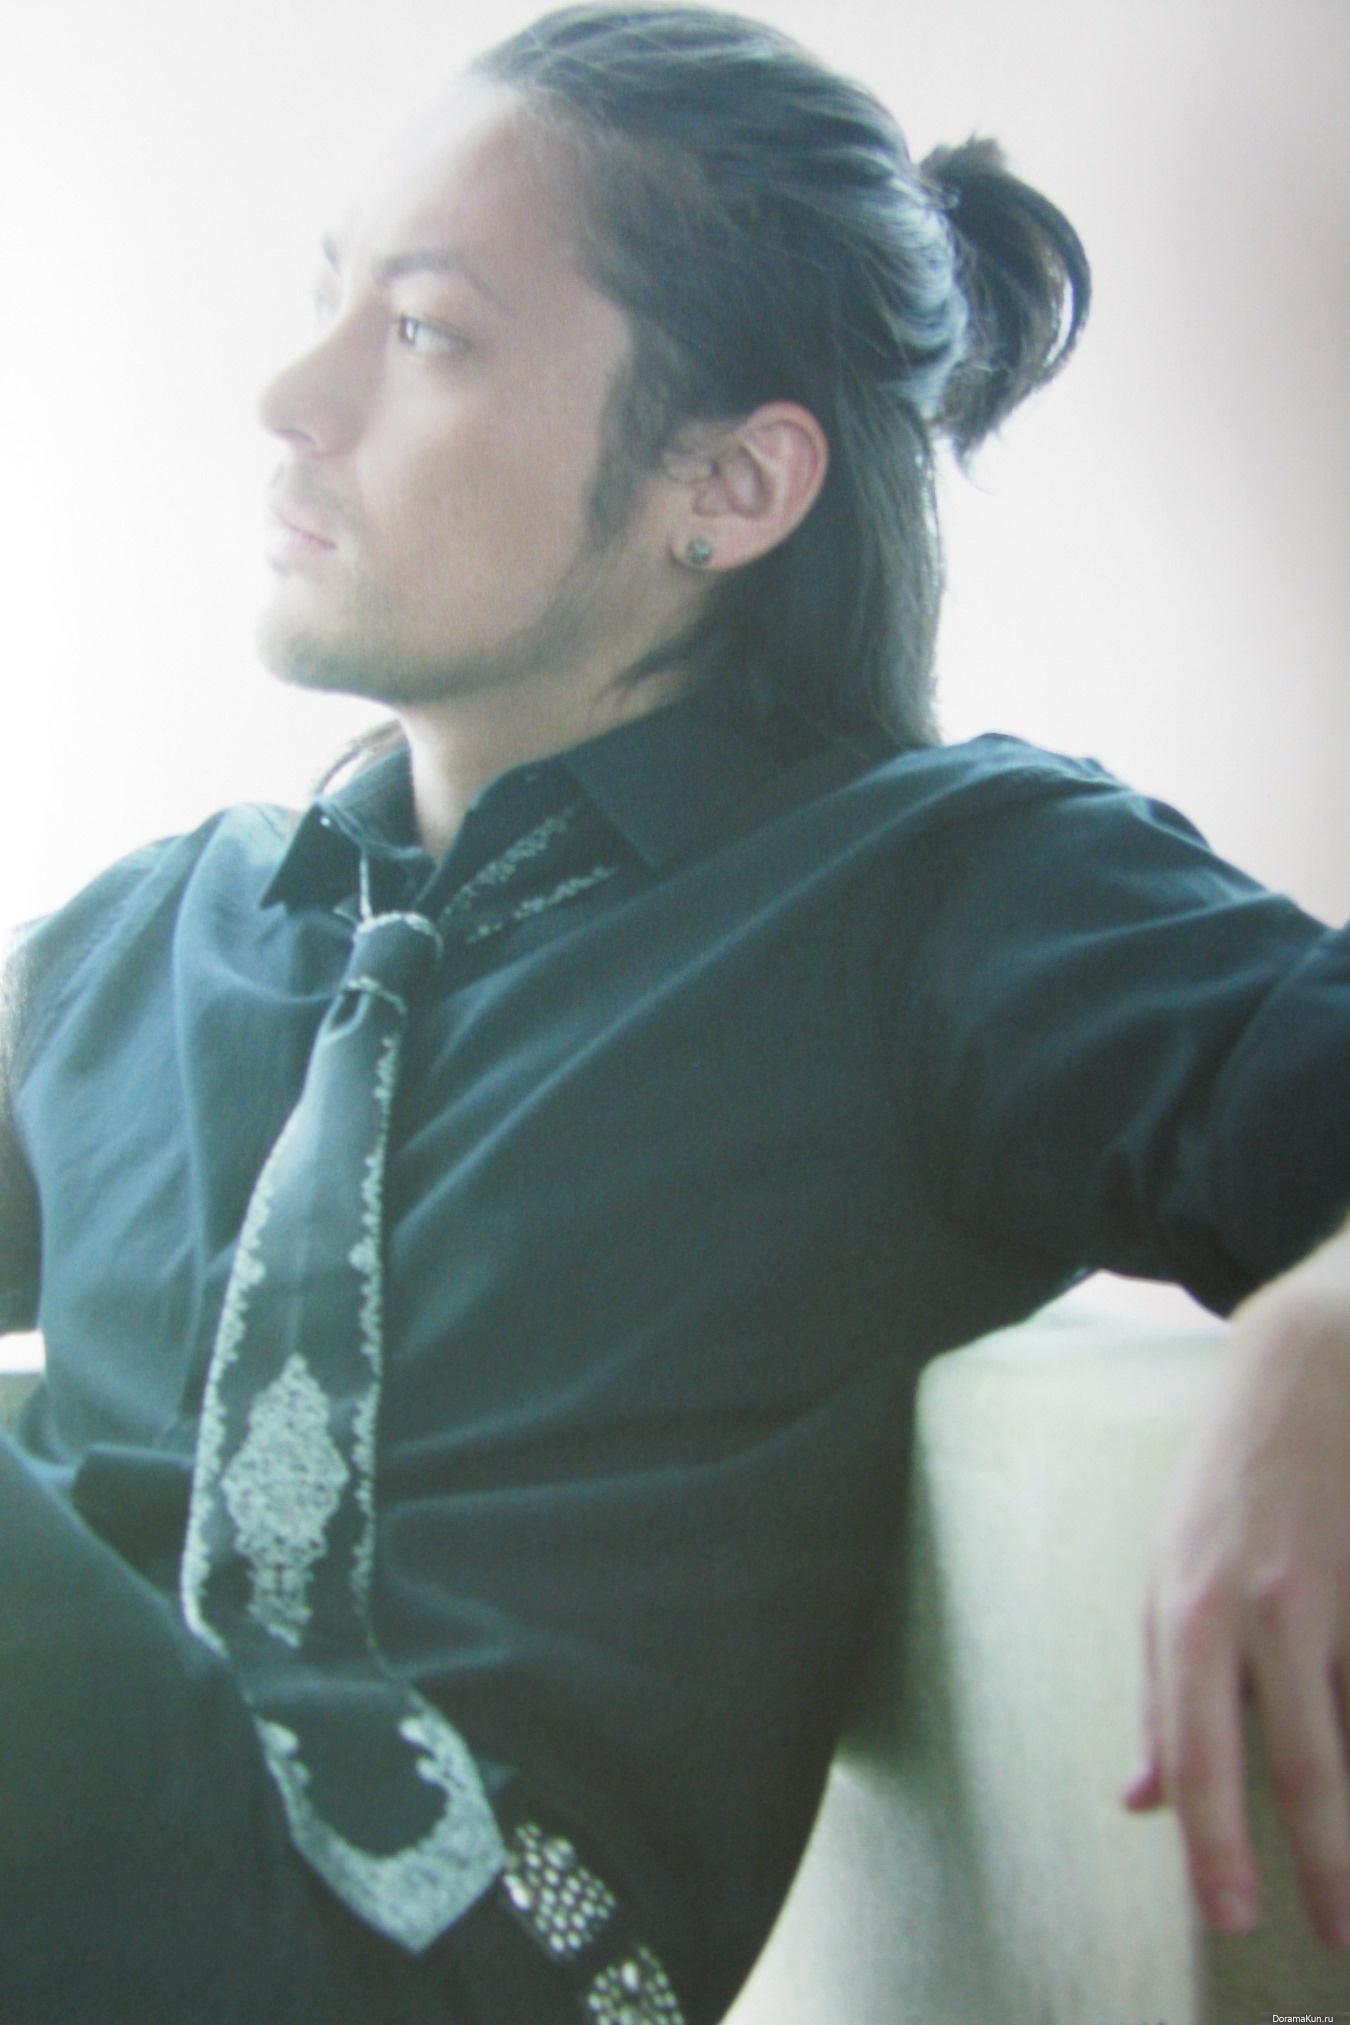 takayuki yamada on pinterest